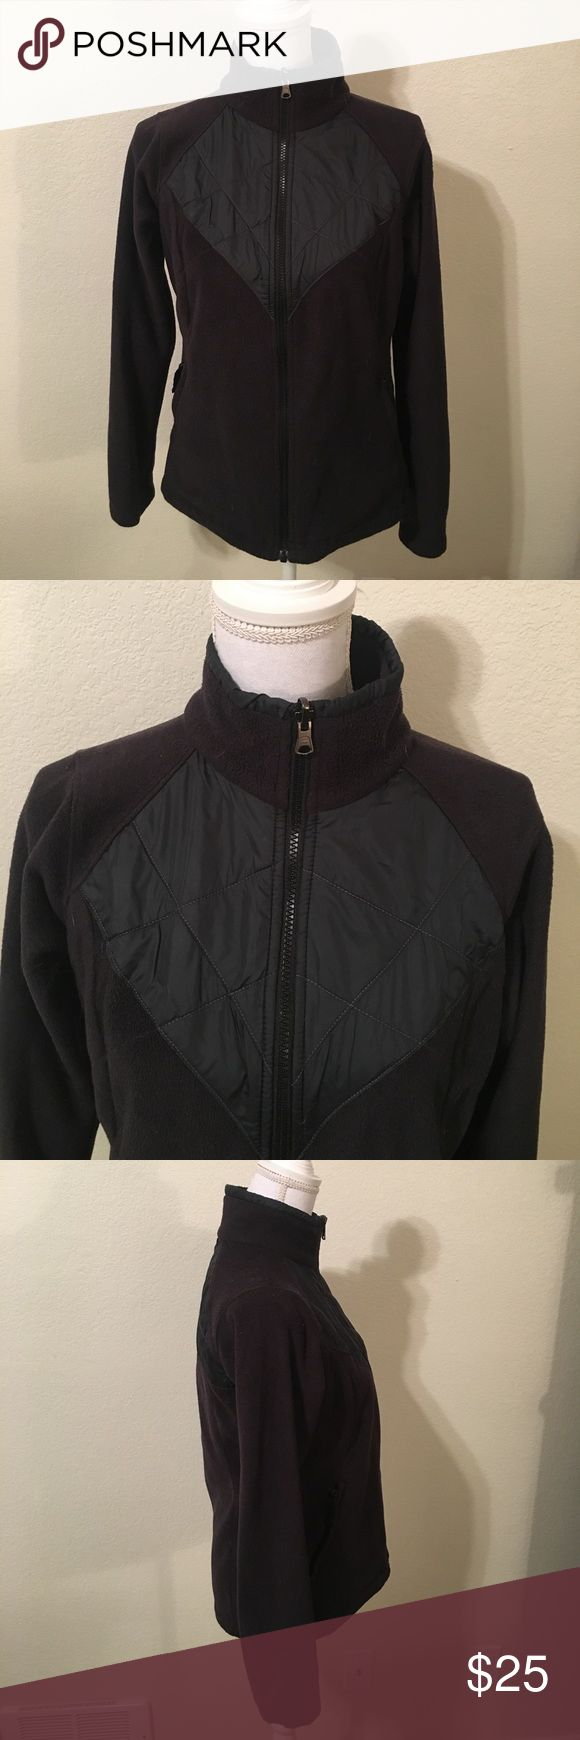 Columbia Jacket Columbia Interchange Jacket.  Women's.  Medium.  Good condition. Columbia Jackets & Coats